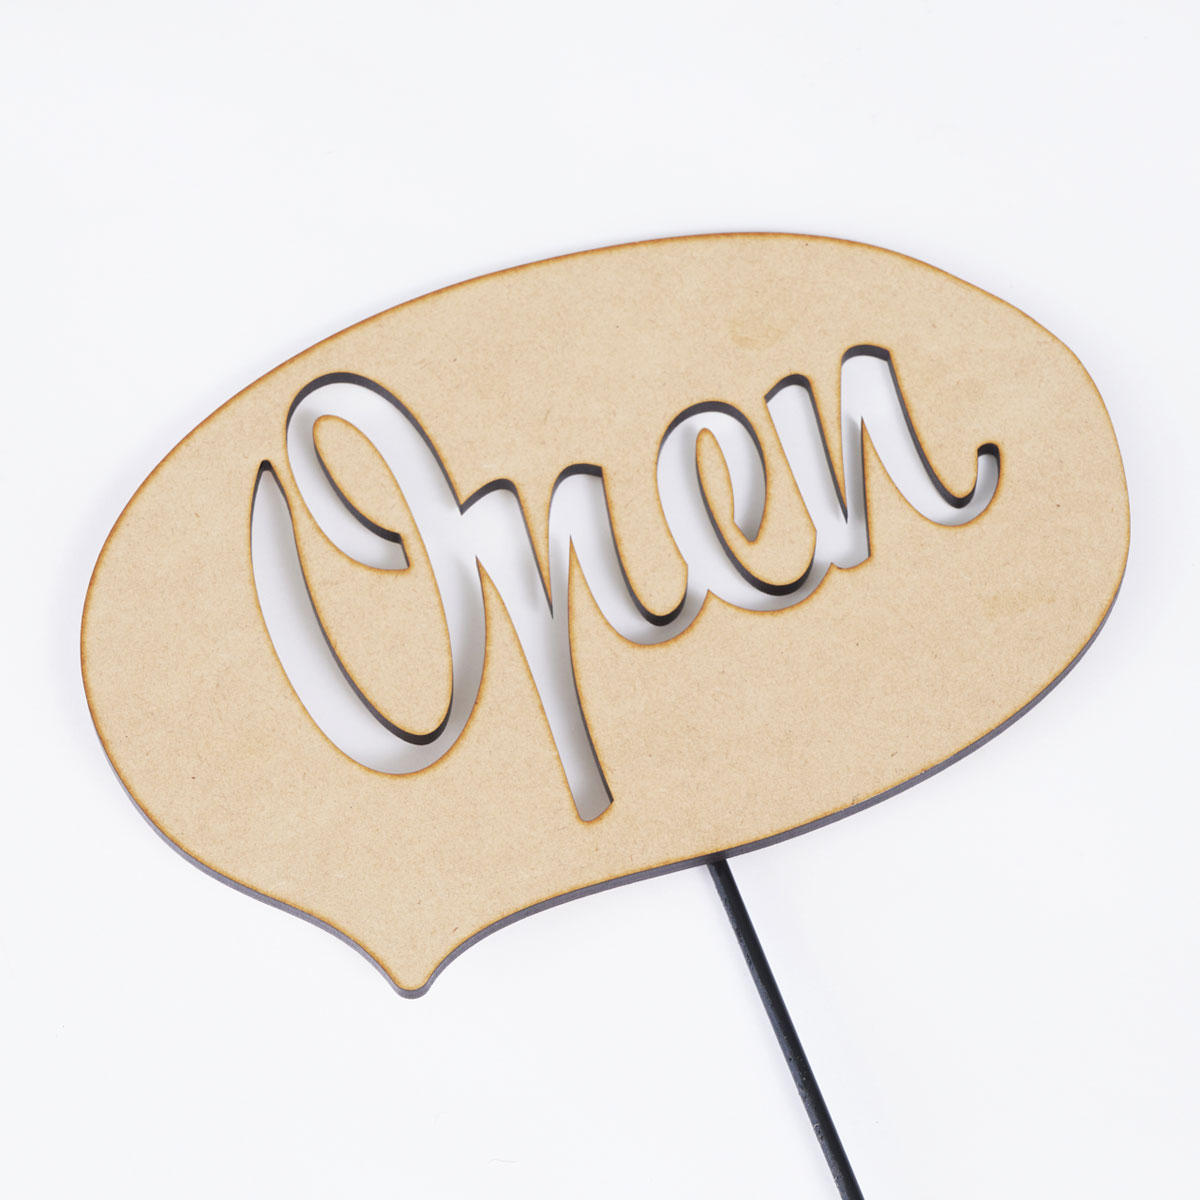 <p>「Open」の文字をくり抜いたメッセージ立札です。</p>